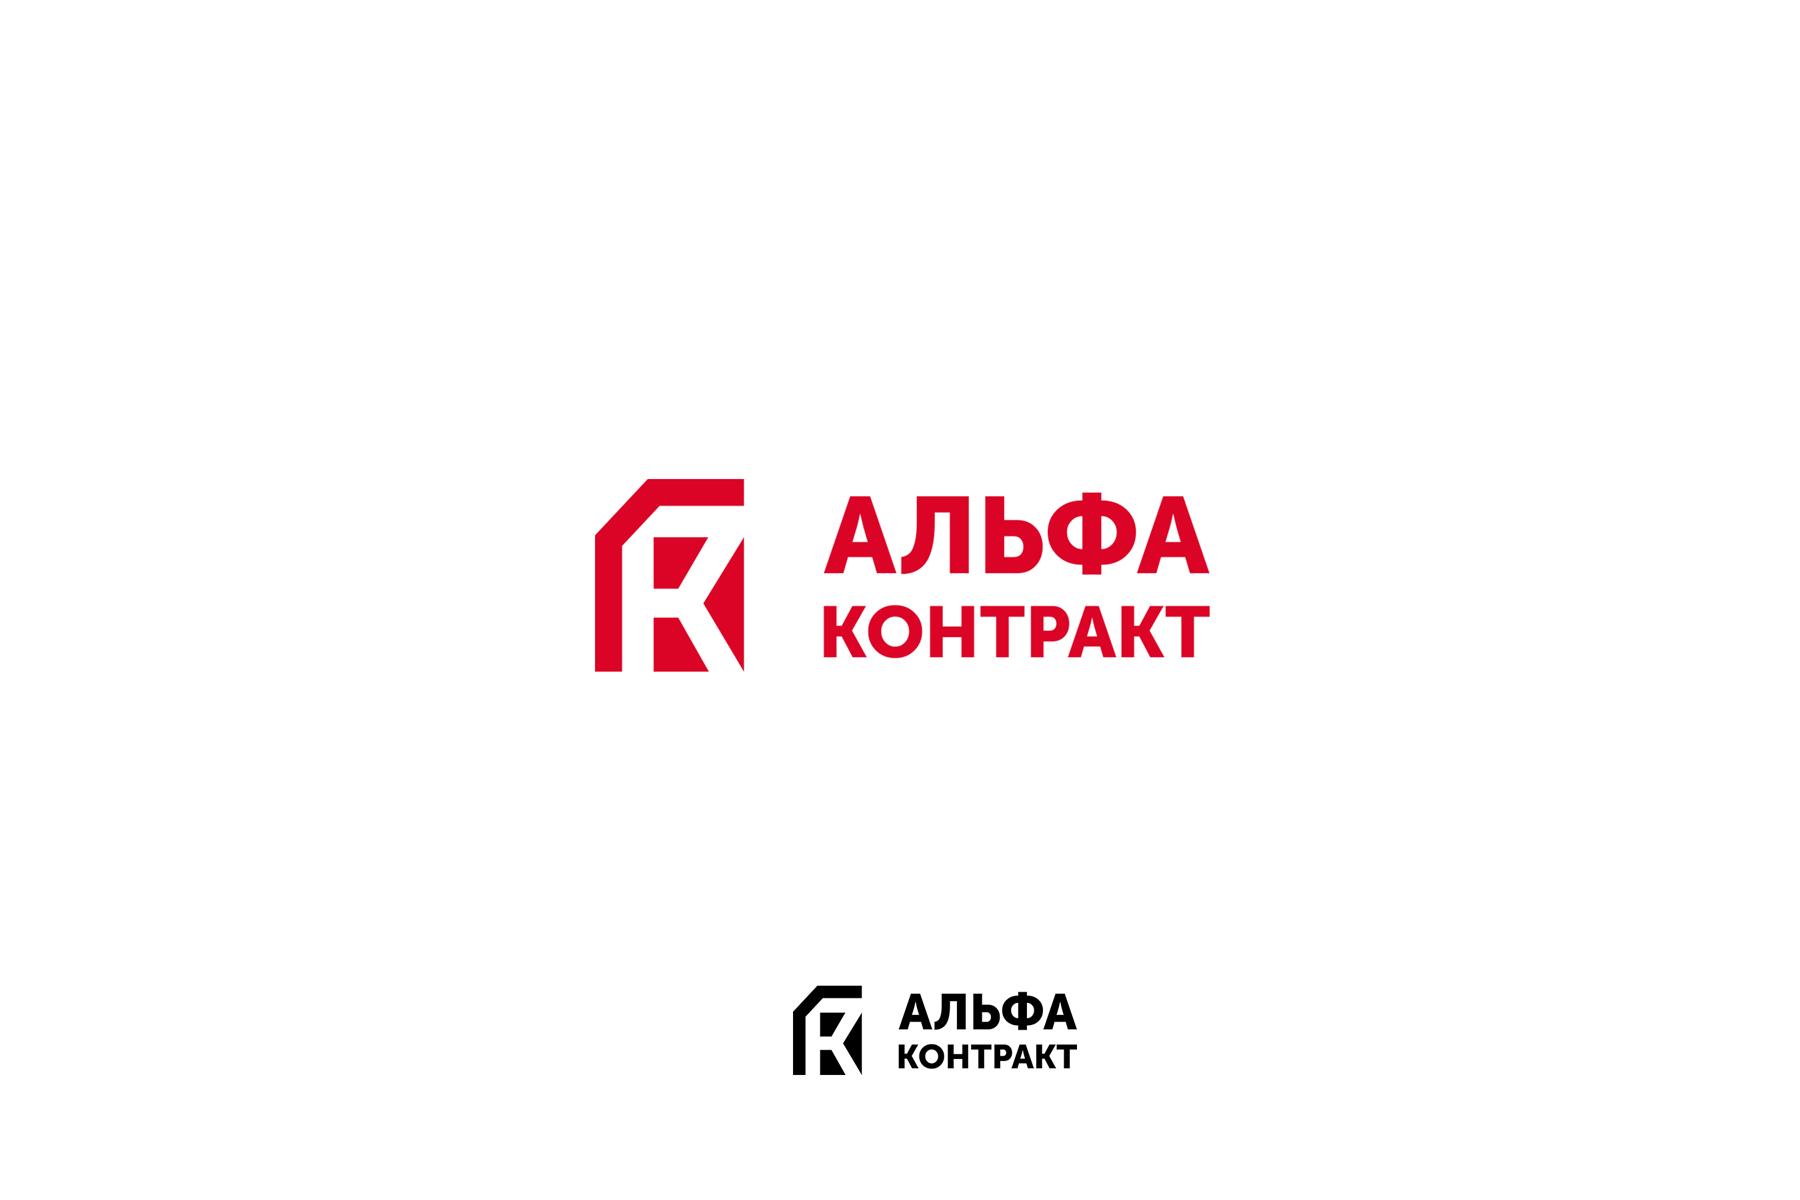 Дизайнер для разработки логотипа компании фото f_0255bfe1e528cfdc.jpg